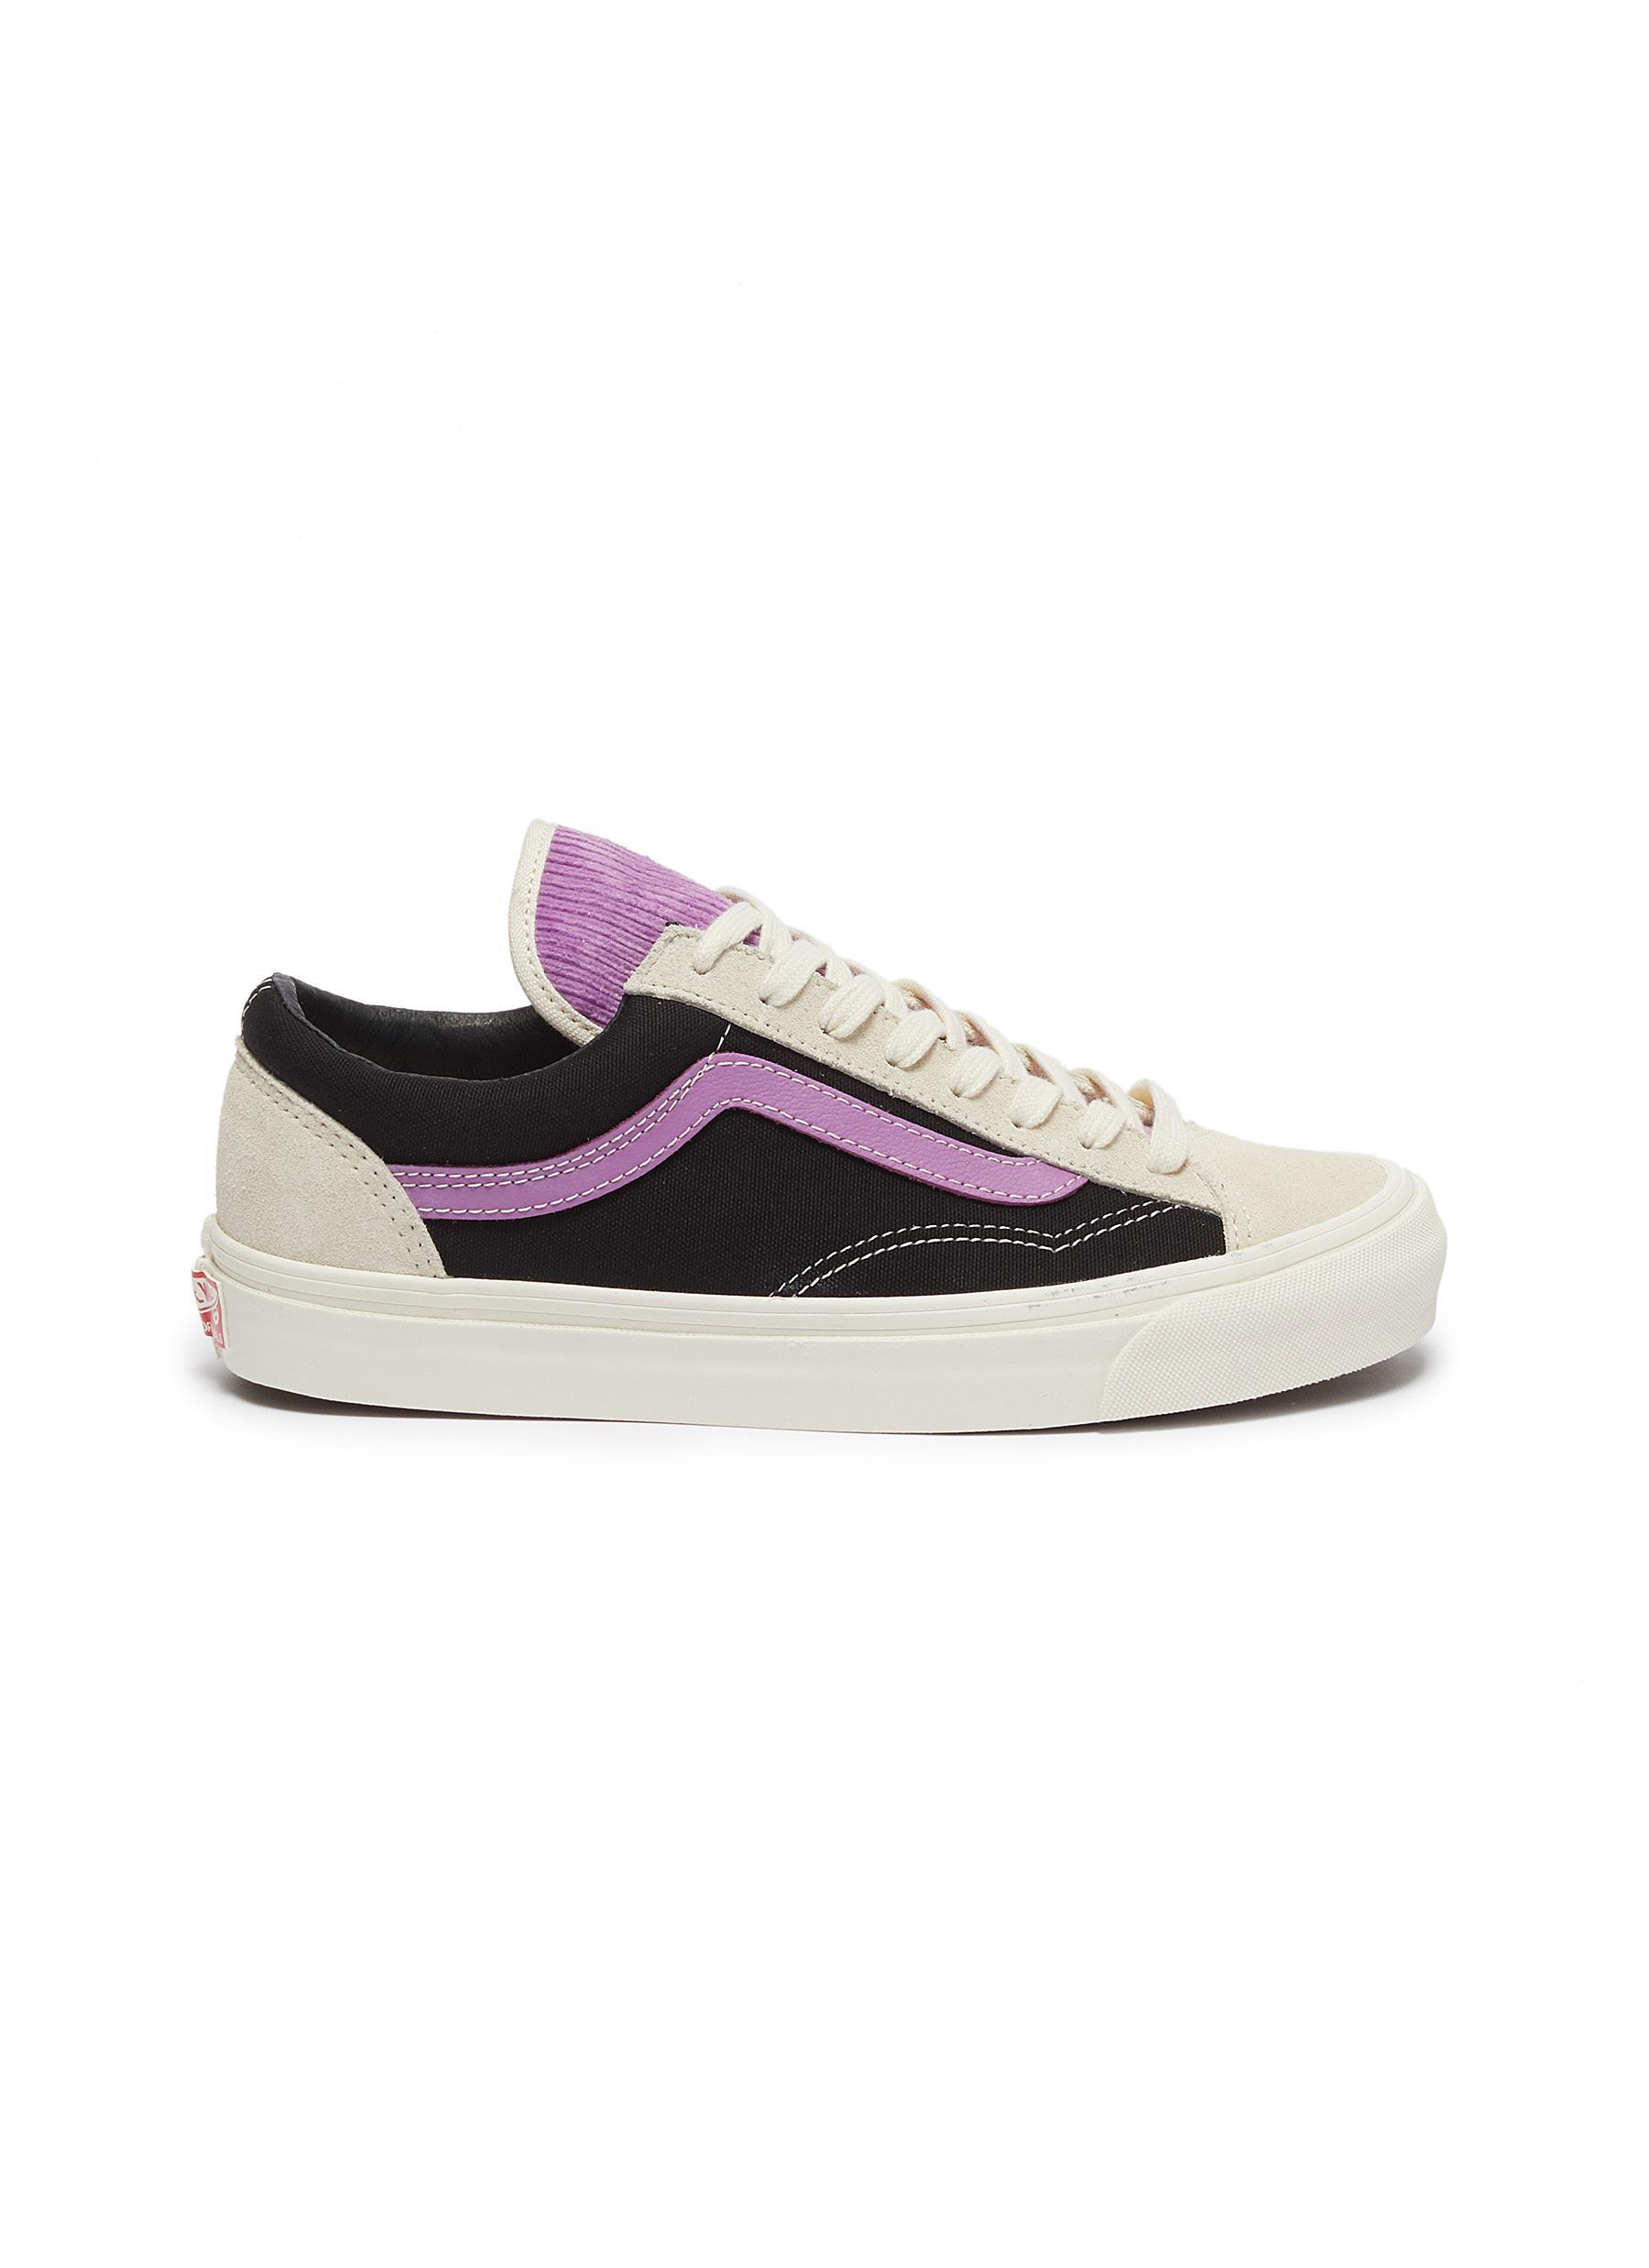 Vans Sneakers OG Style 36 LX colourblock corduroy tongue sneakers